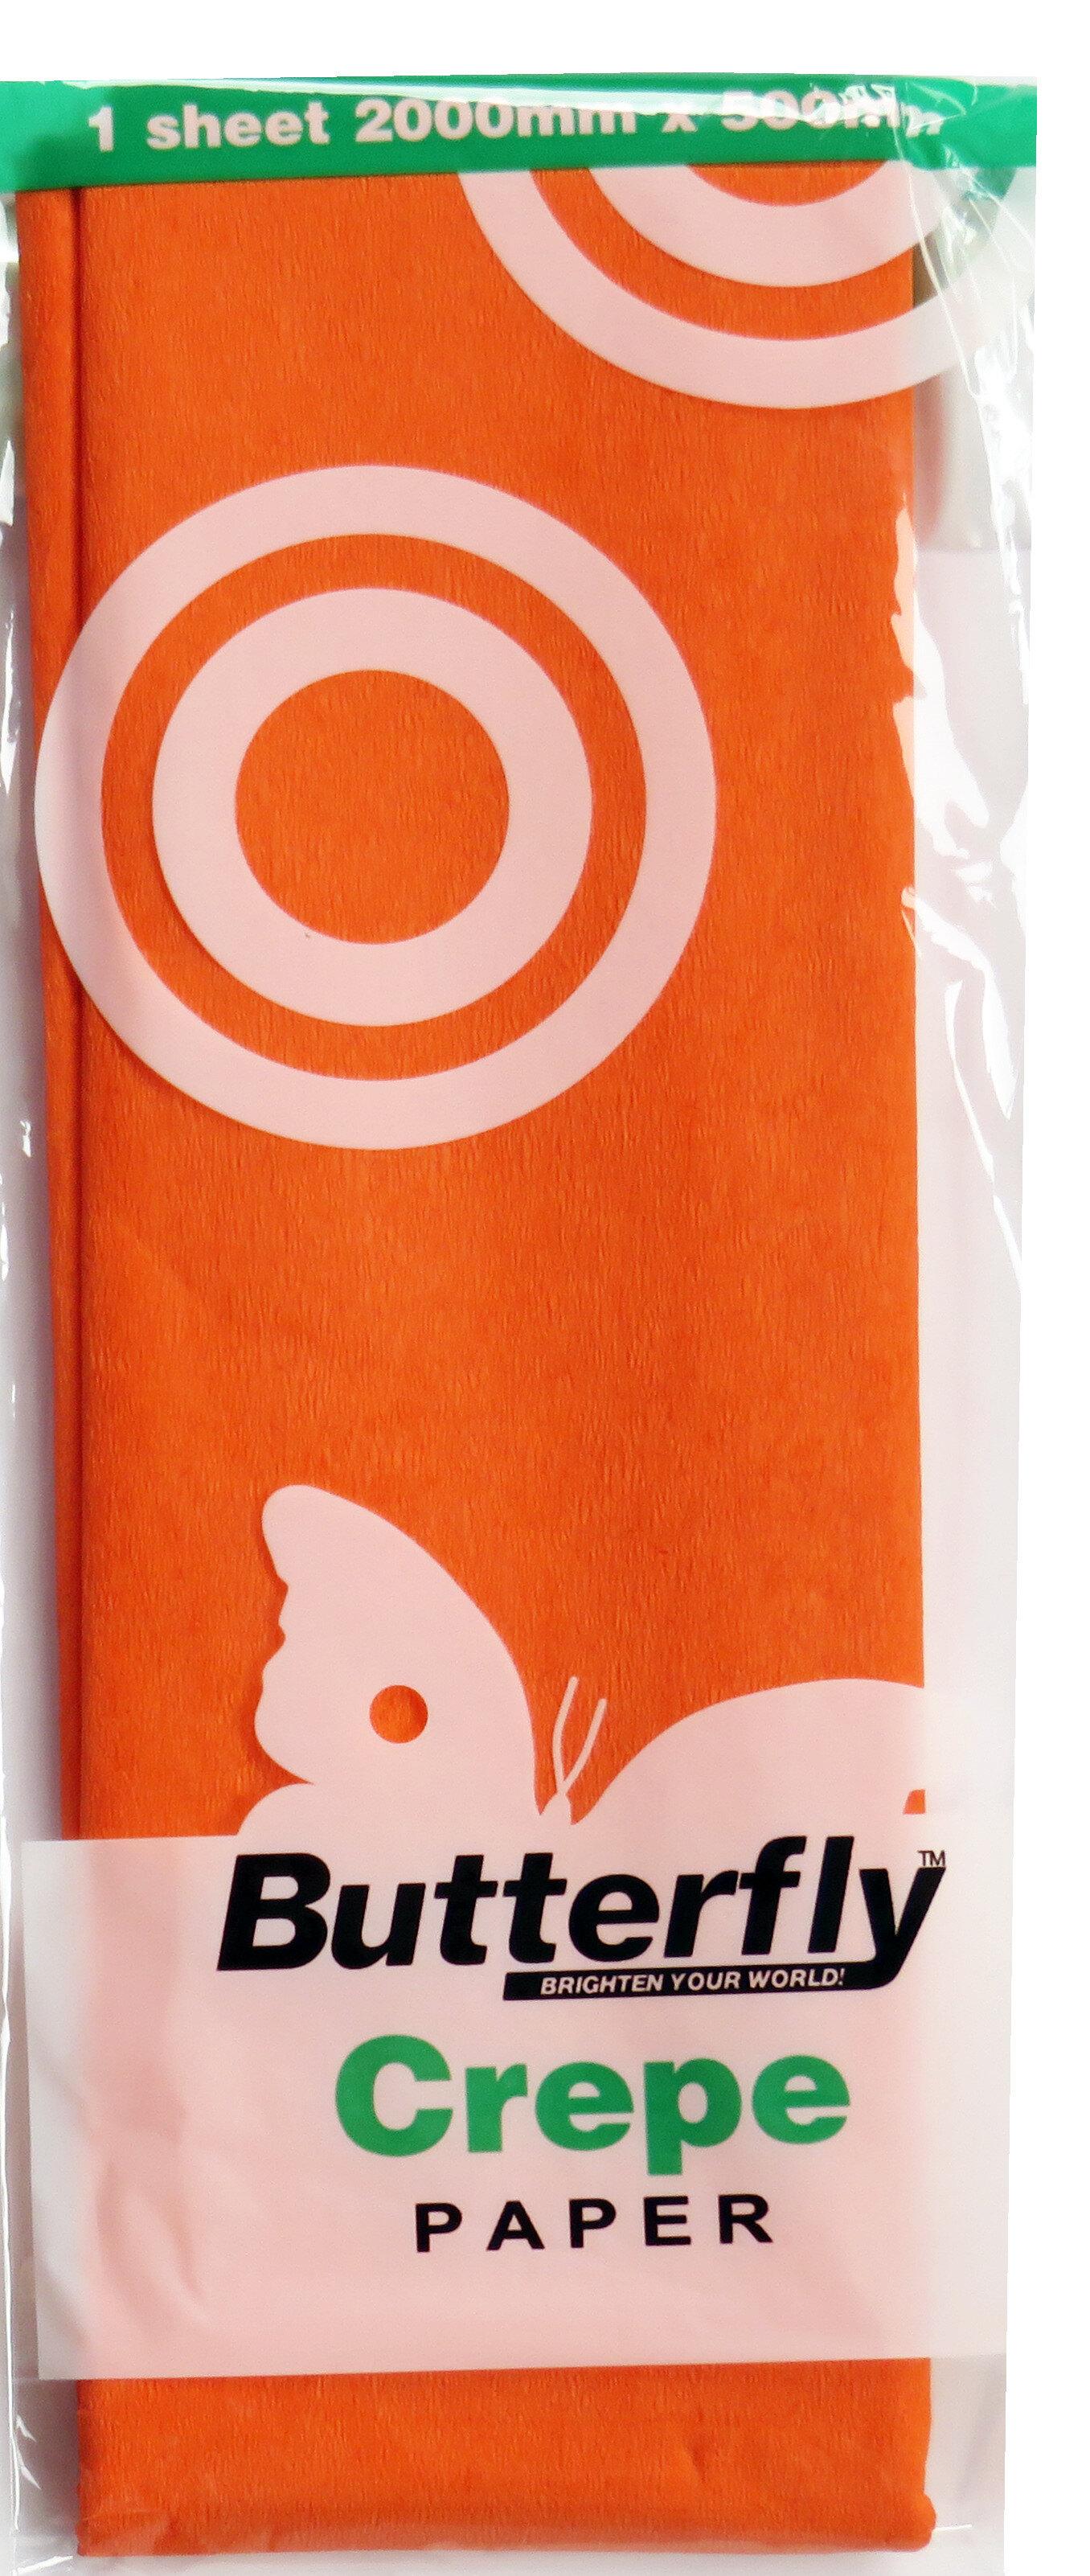 Crepe Paper - 1 Sheet (2m x 500mm) Orange